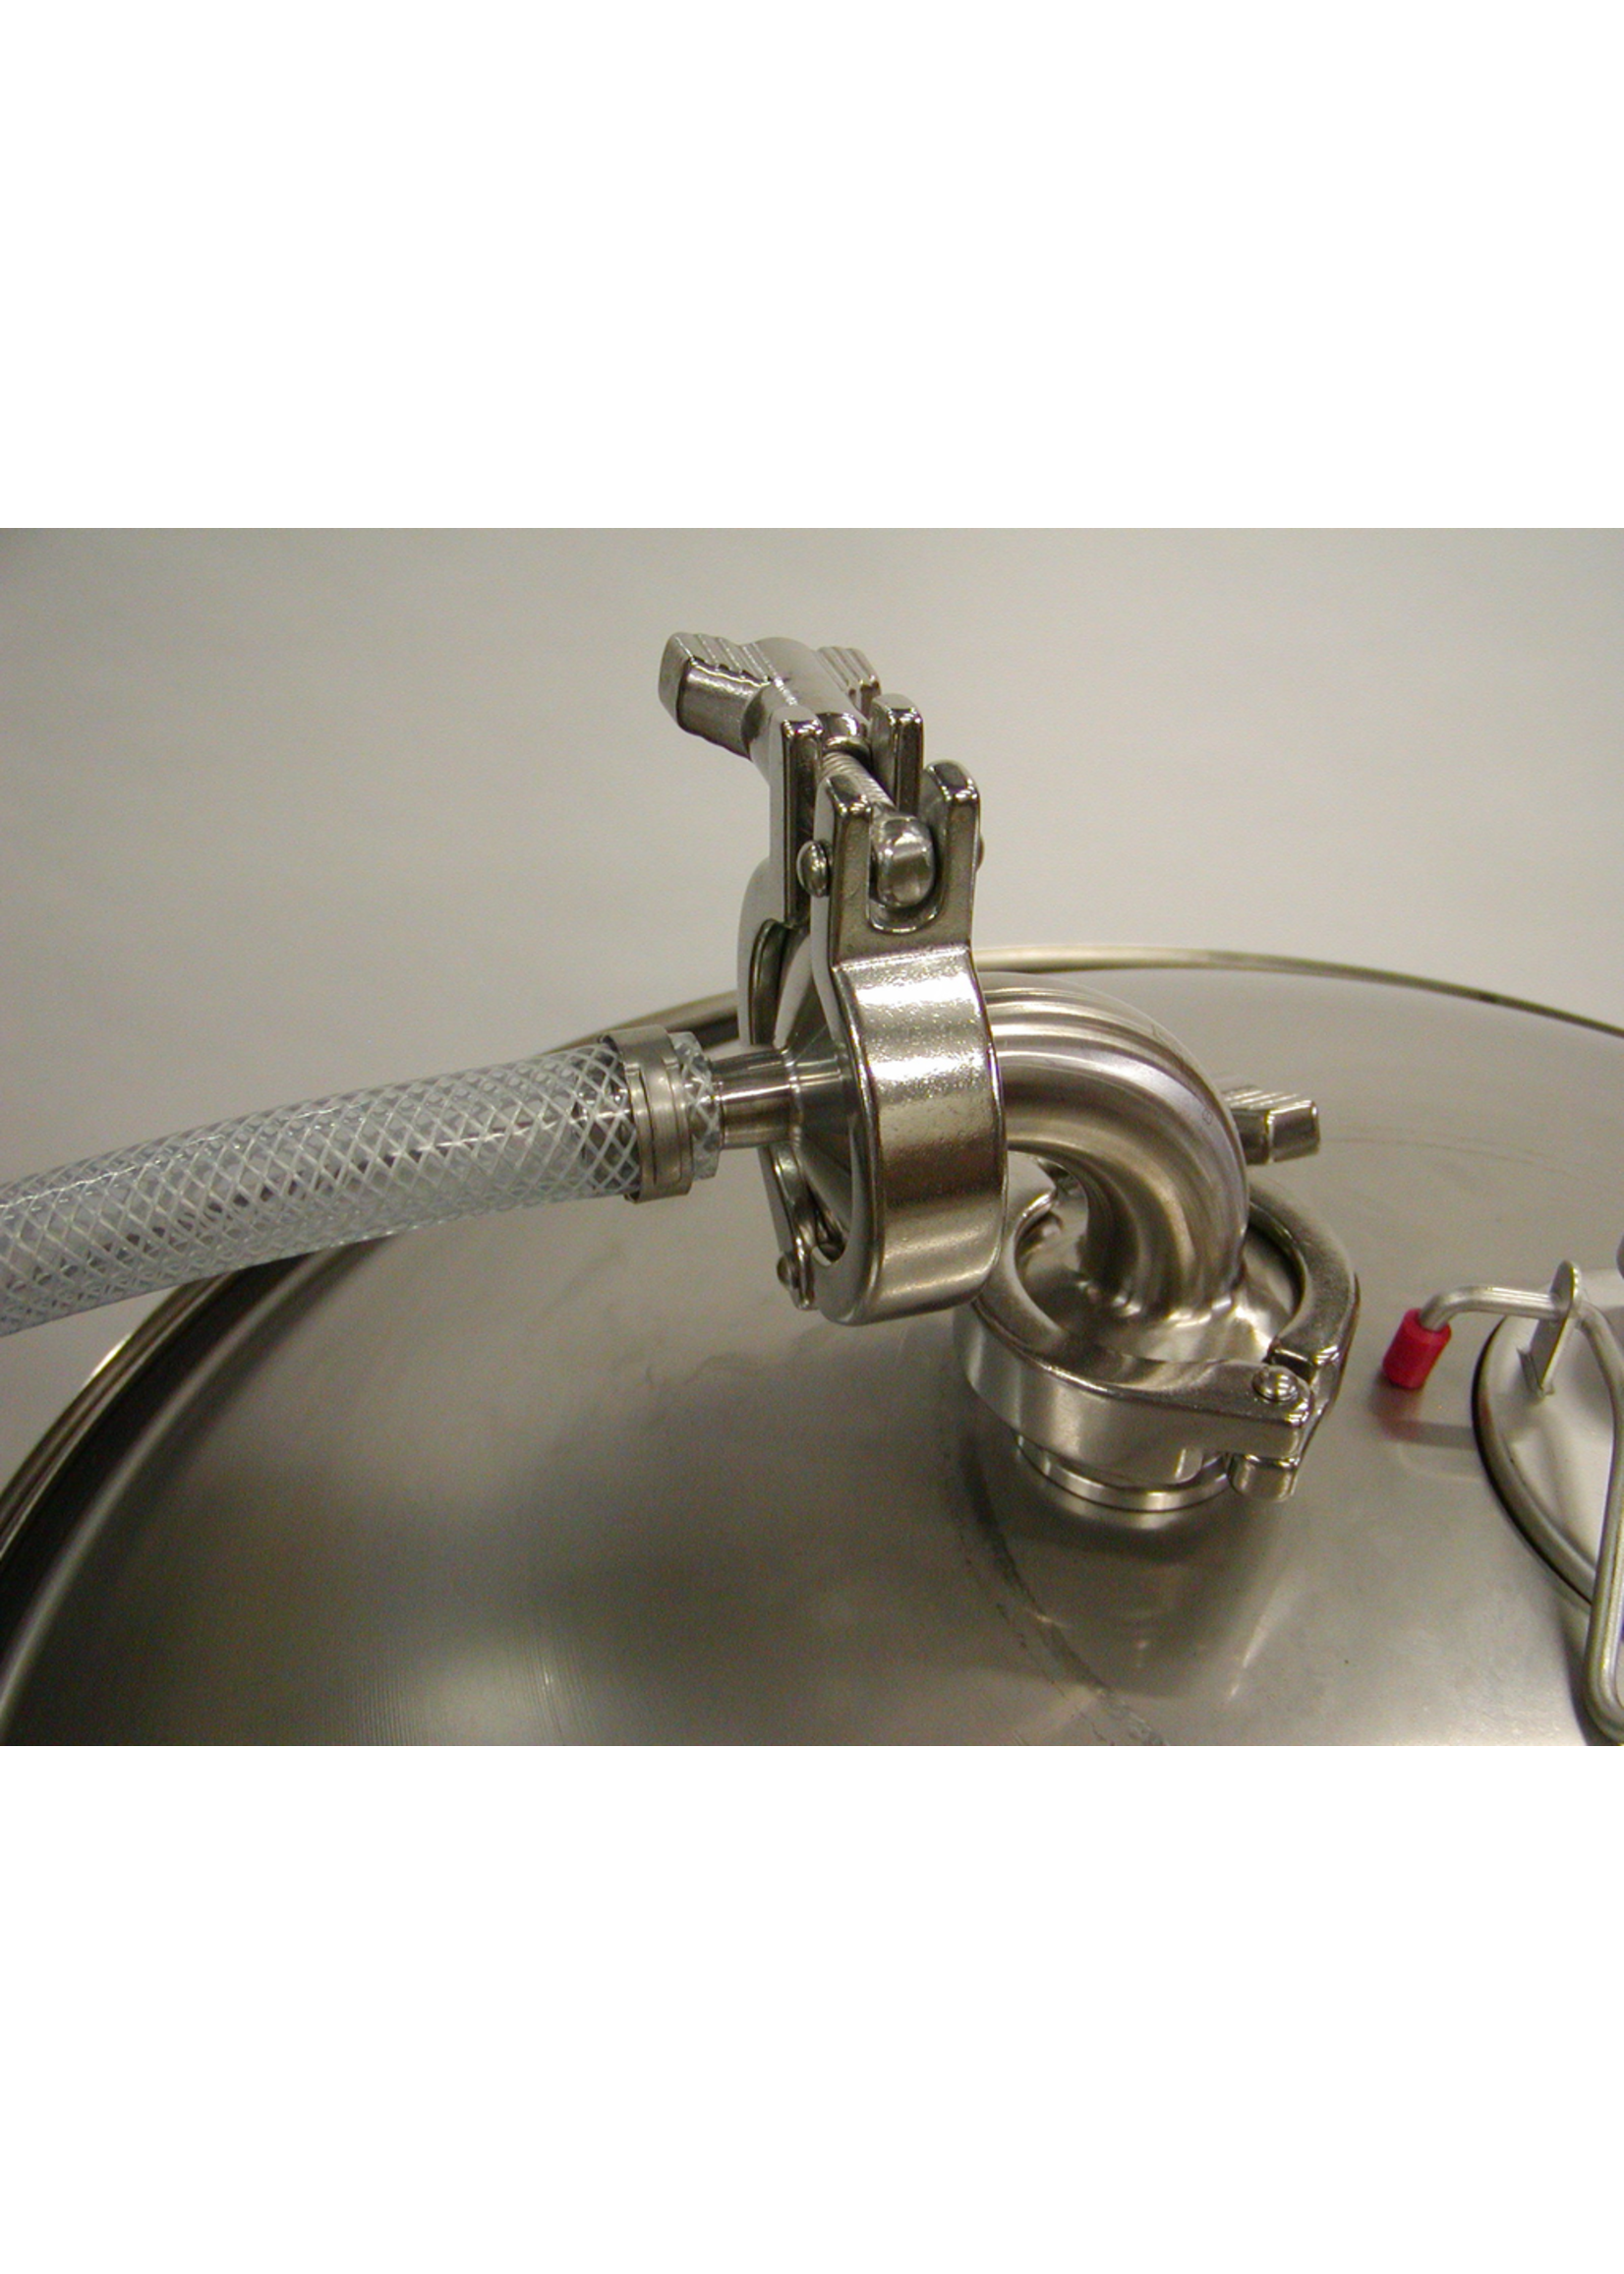 Blichmann Blichmann Fermenator - Tri-clamp Blow Off Assembly (Fits All Conicals)